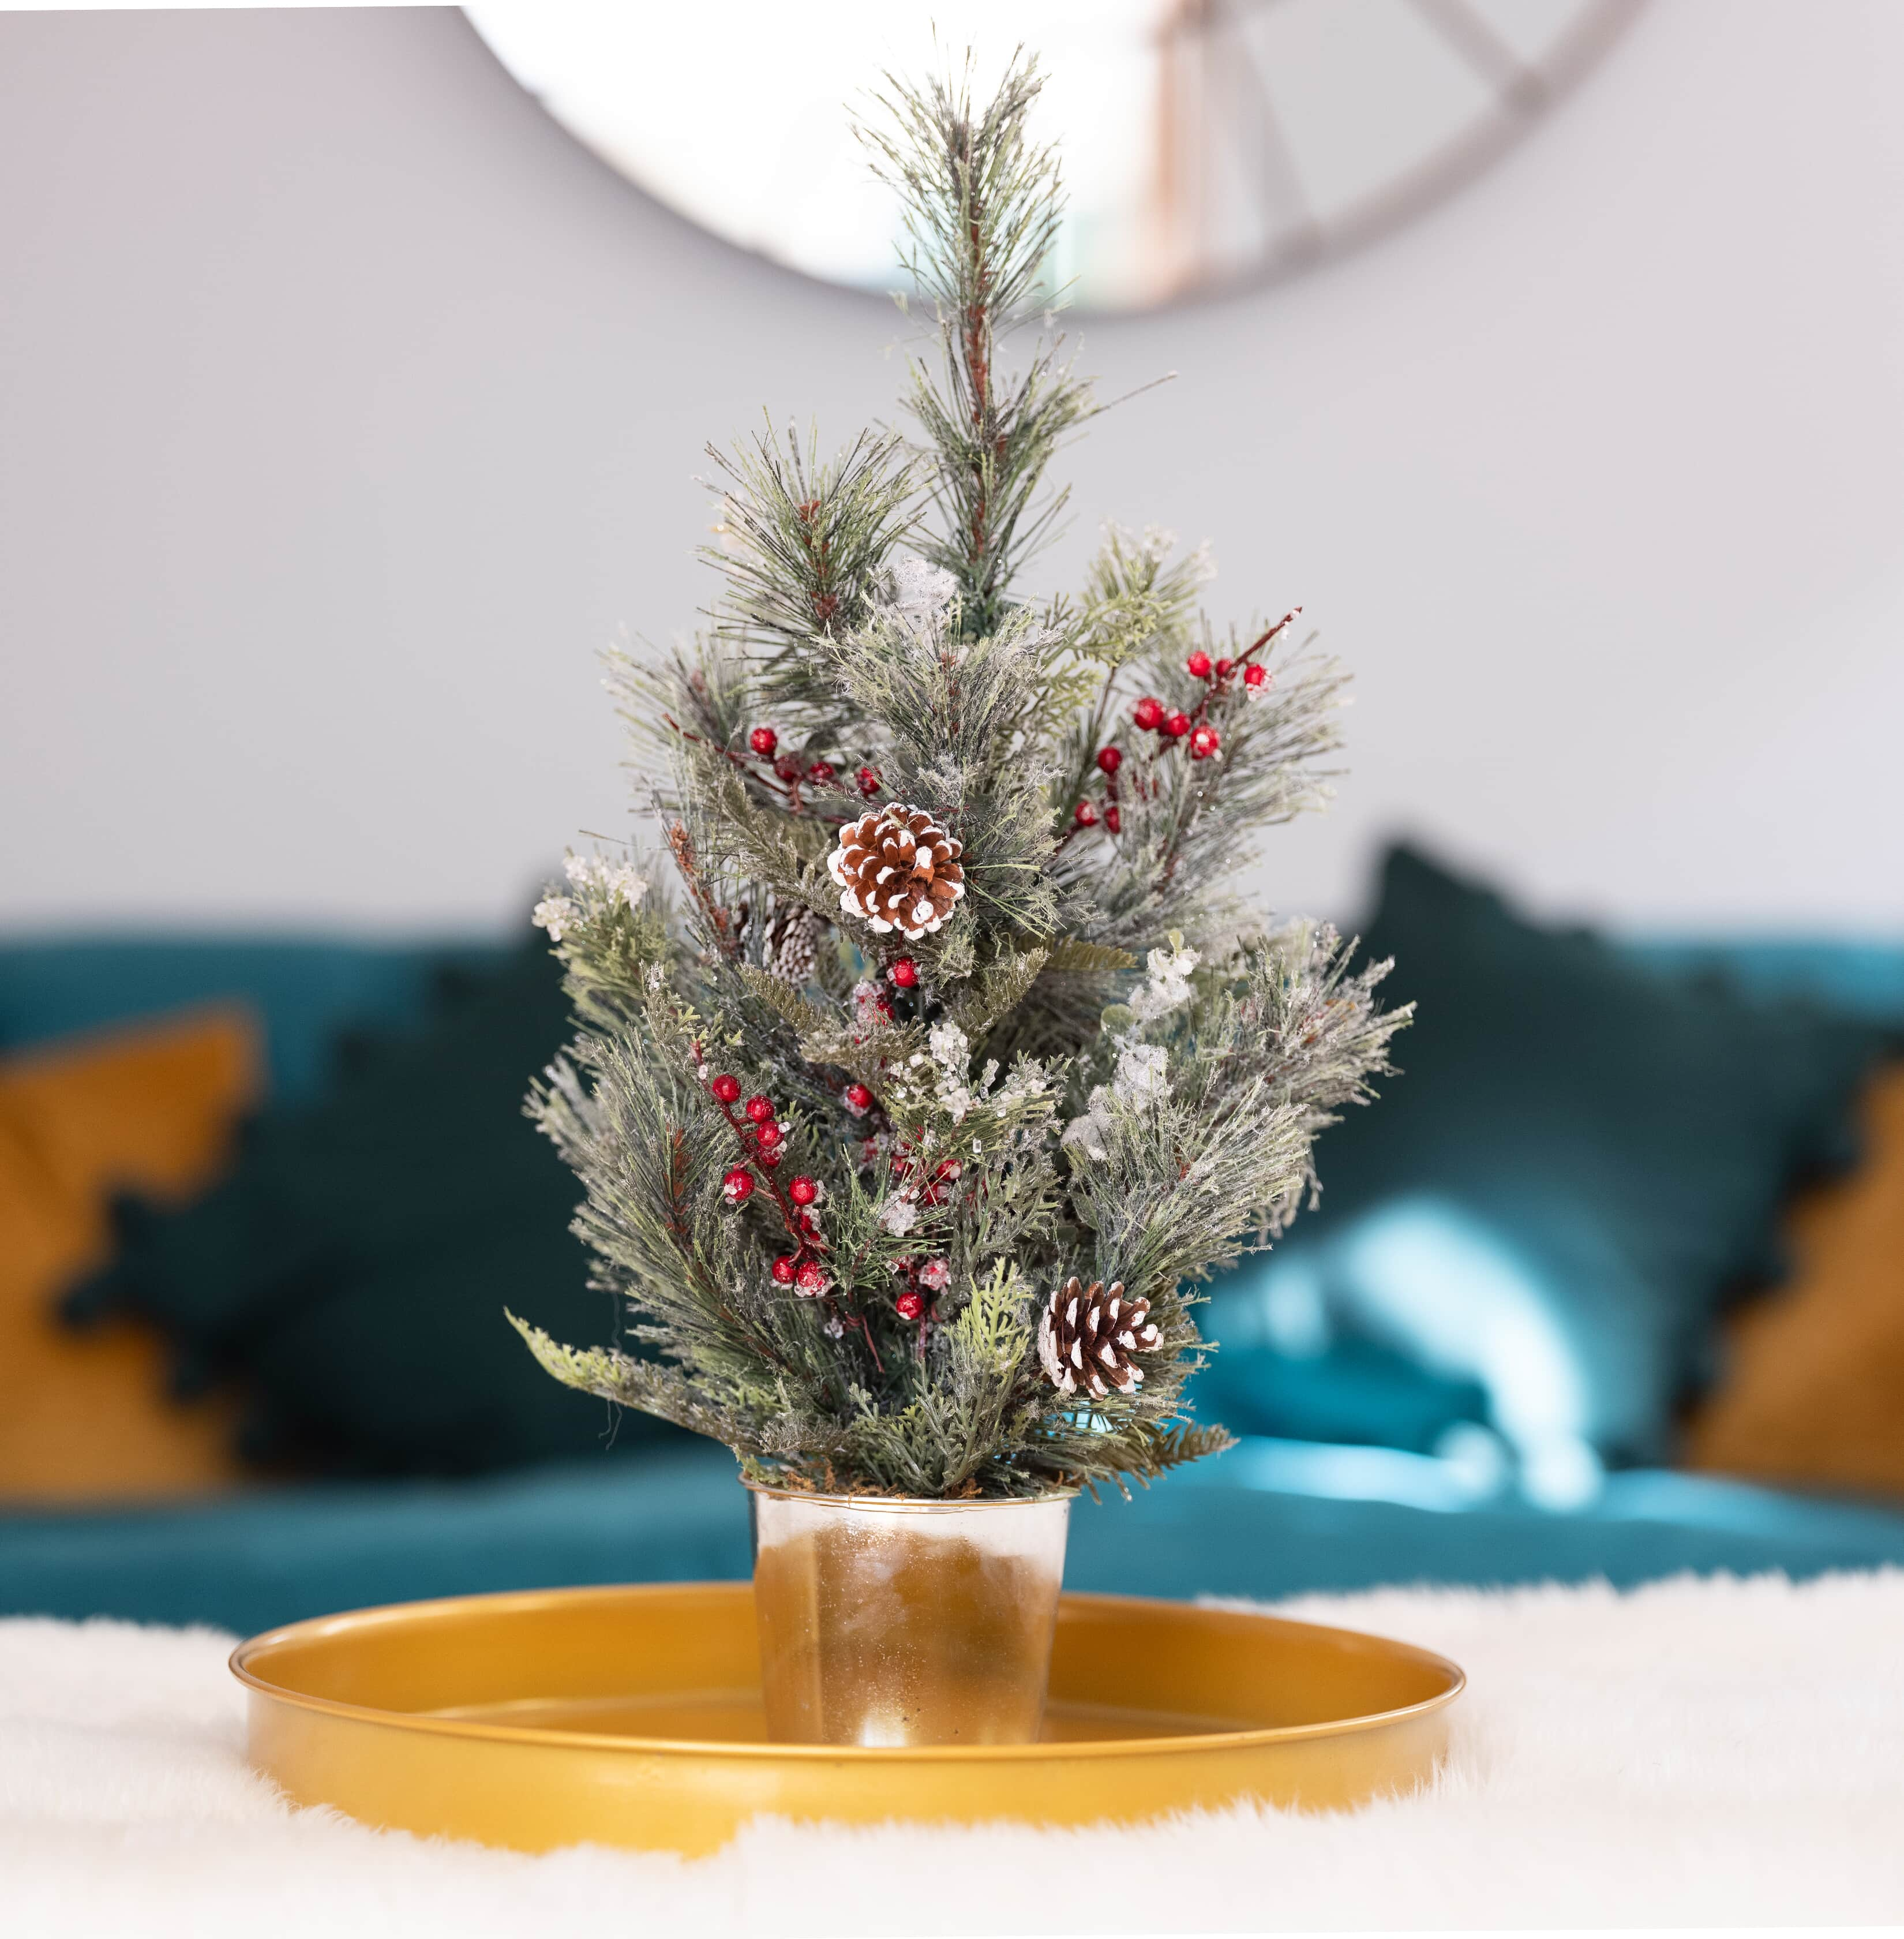 artificial mini festive cedar pine tree on gold tray